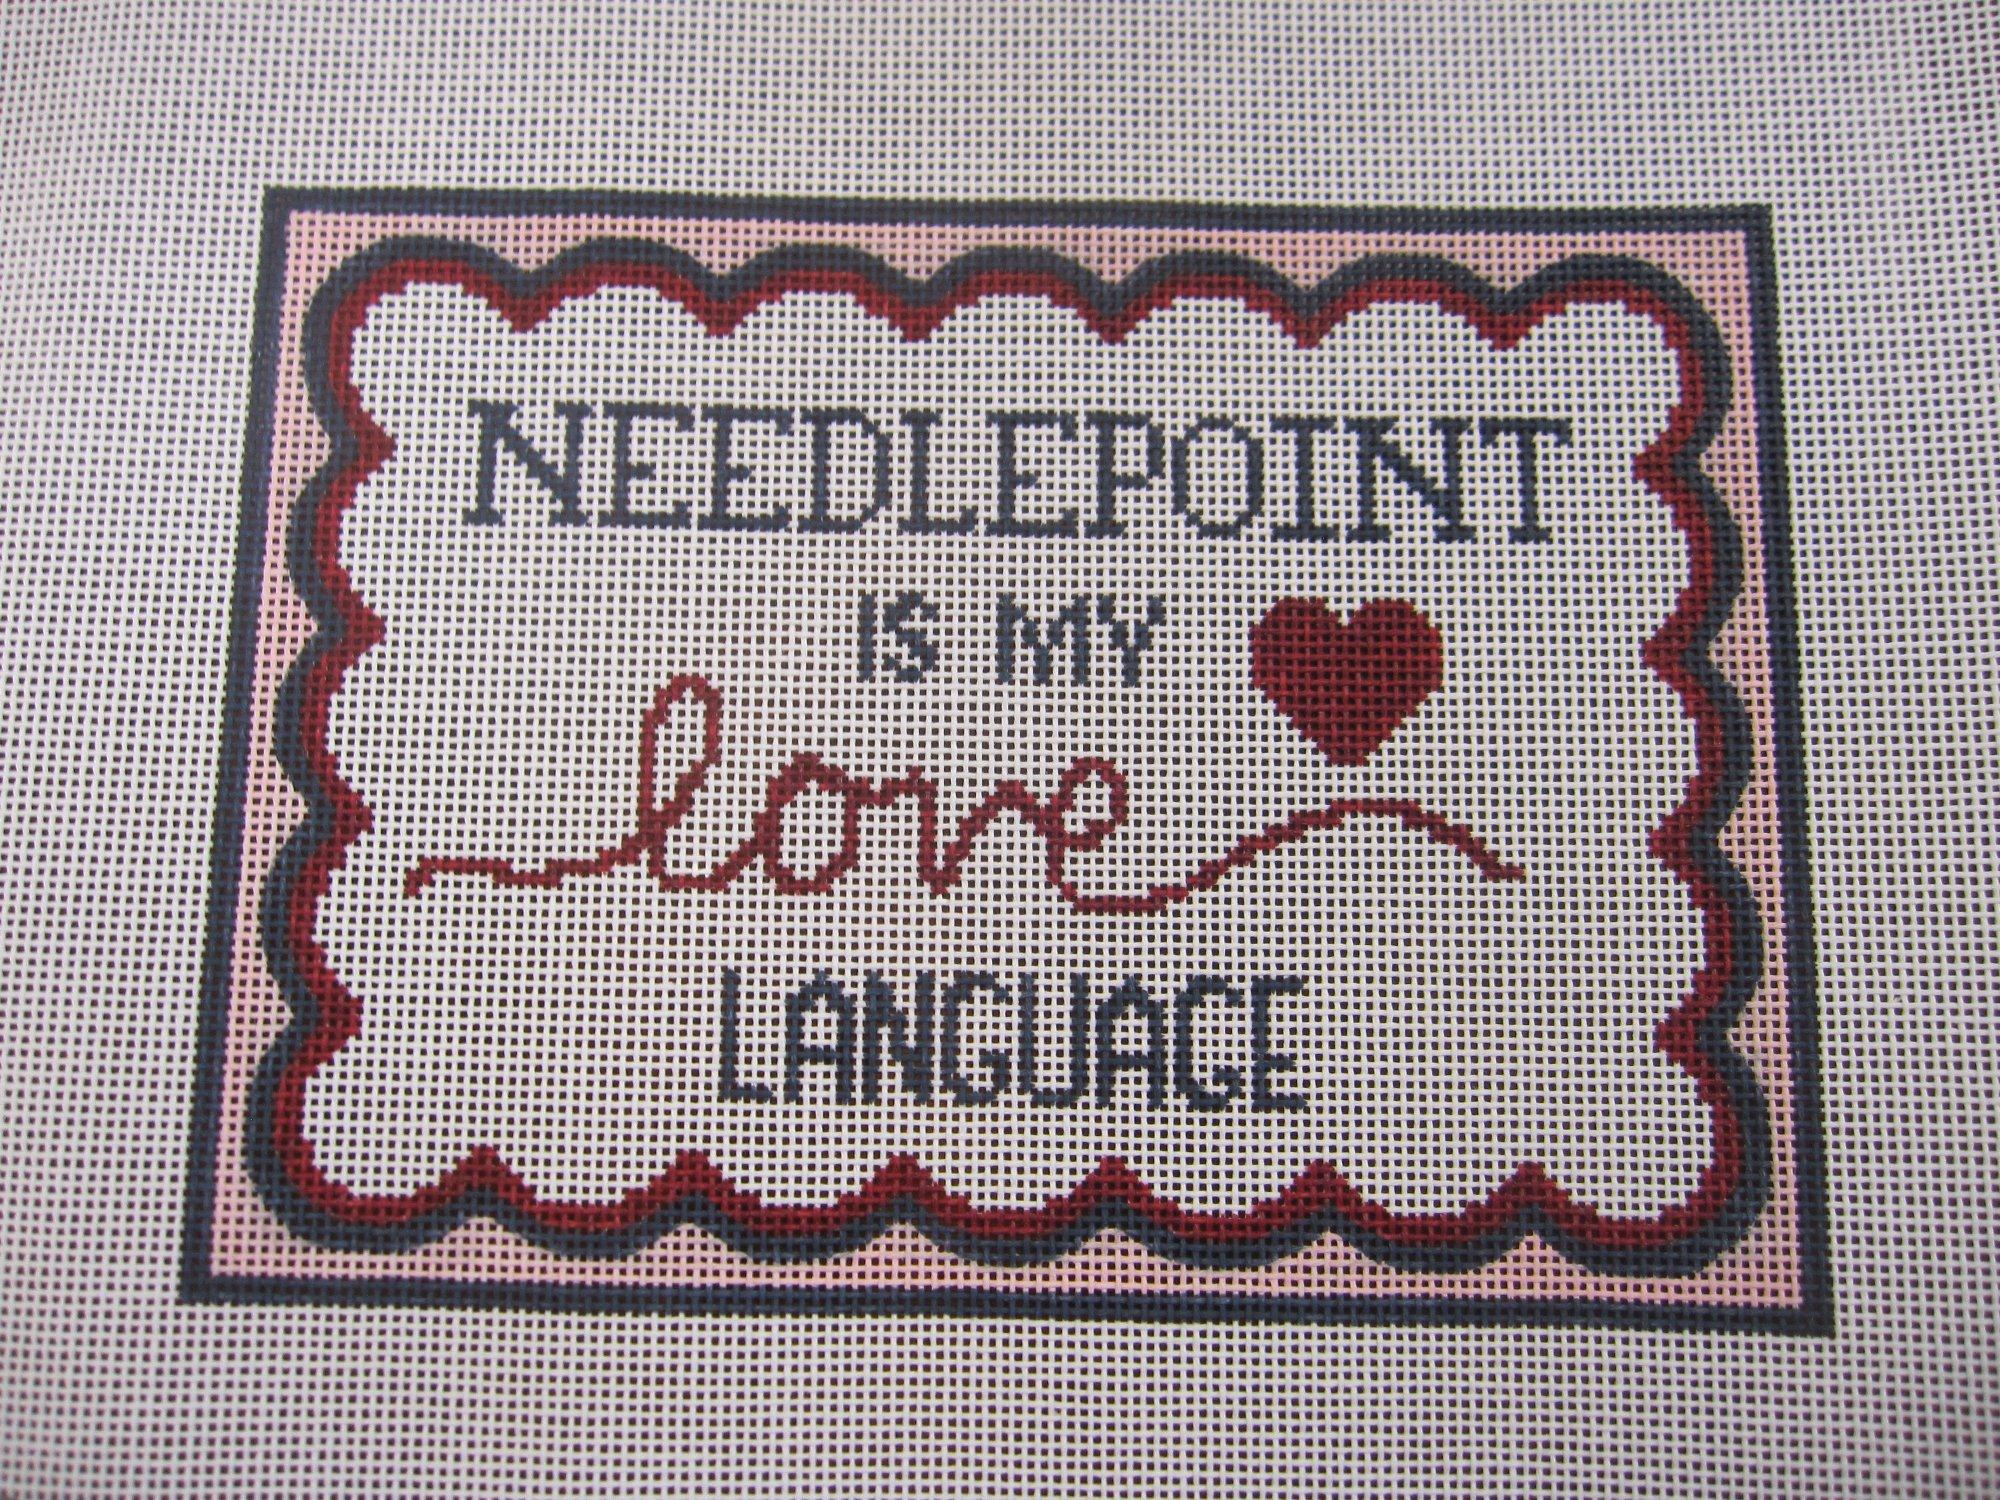 Needlepoint is my Love Language